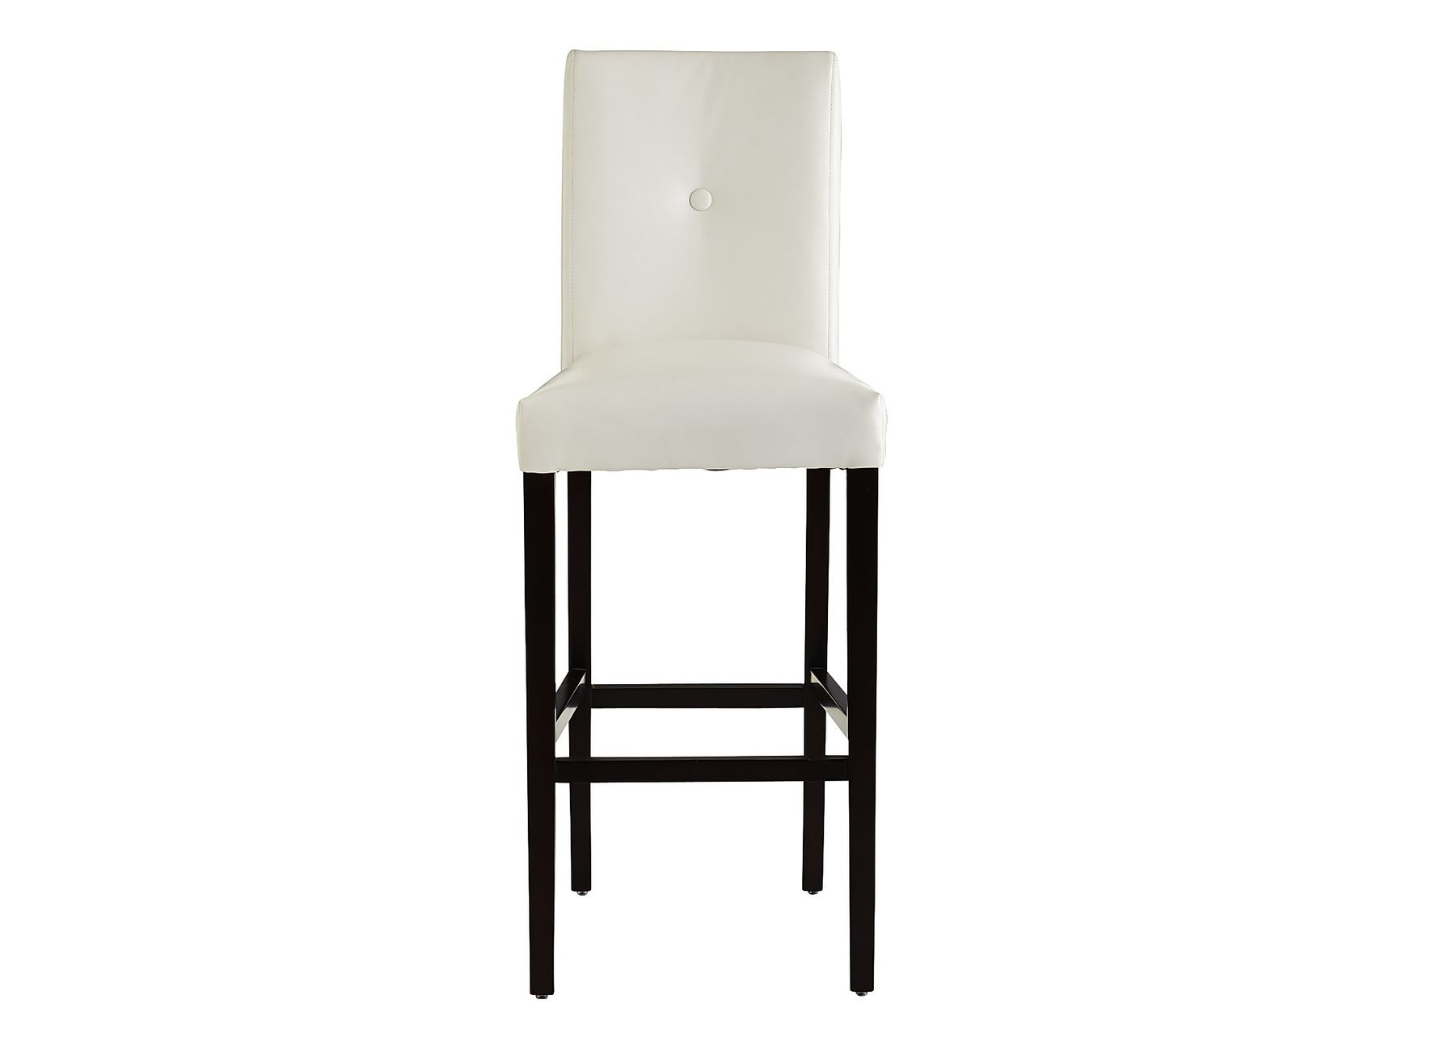 Стул Mason Pure White BarБарные стулья<br>&amp;lt;div&amp;gt;Ножки выполнены из дуба, материал: текстиль.&amp;lt;br&amp;gt;&amp;lt;/div&amp;gt;&amp;lt;div&amp;gt;Высота сидения: 80 см.&amp;lt;/div&amp;gt;<br><br>Material: Дуб<br>Width см: 46<br>Depth см: 56<br>Height см: 117